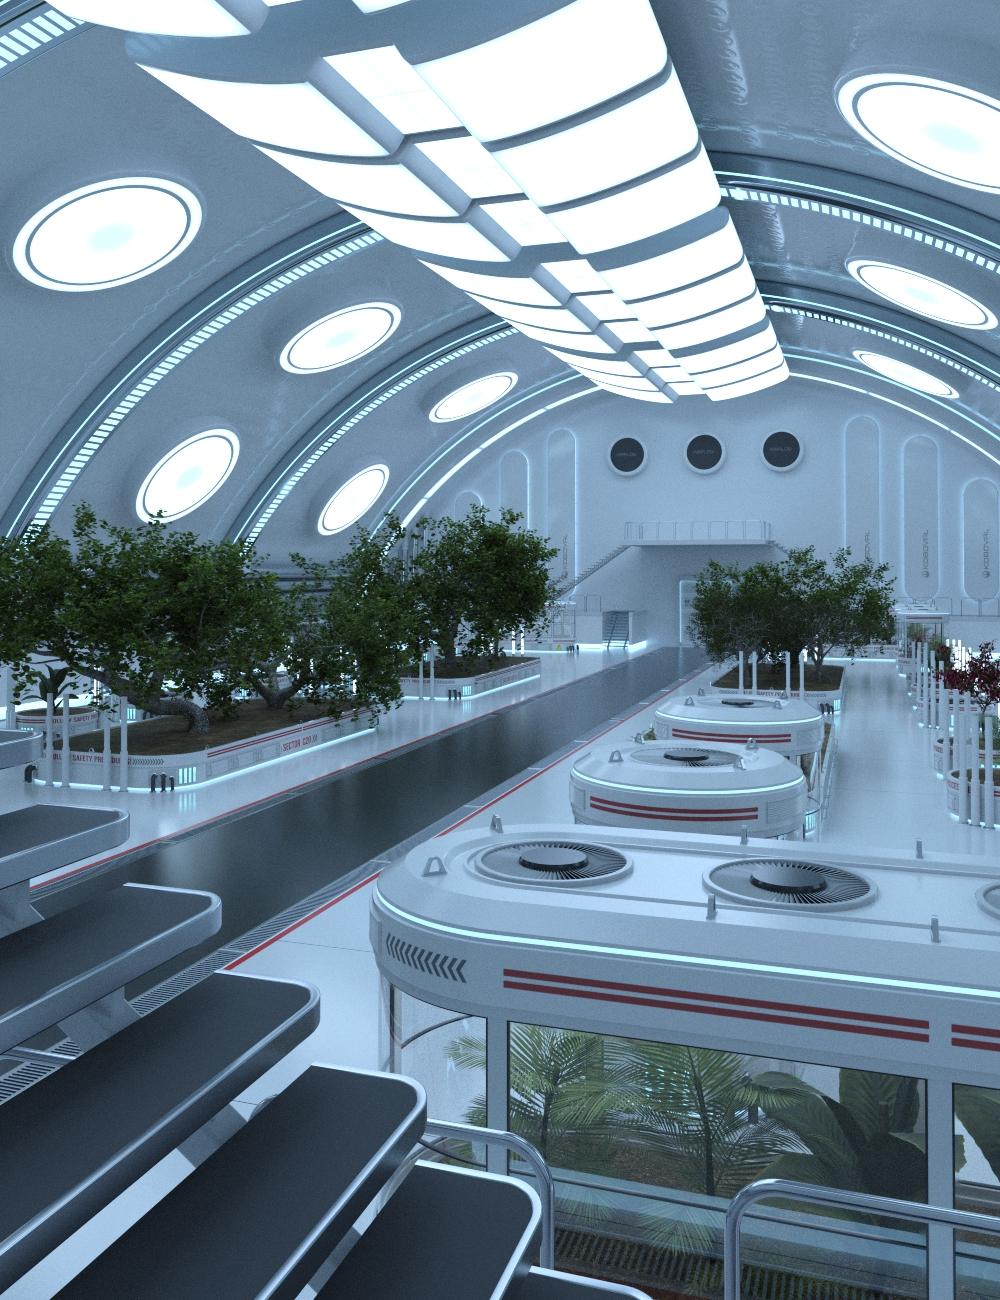 SC20 Botanical Garden by: FToRi, 3D Models by Daz 3D